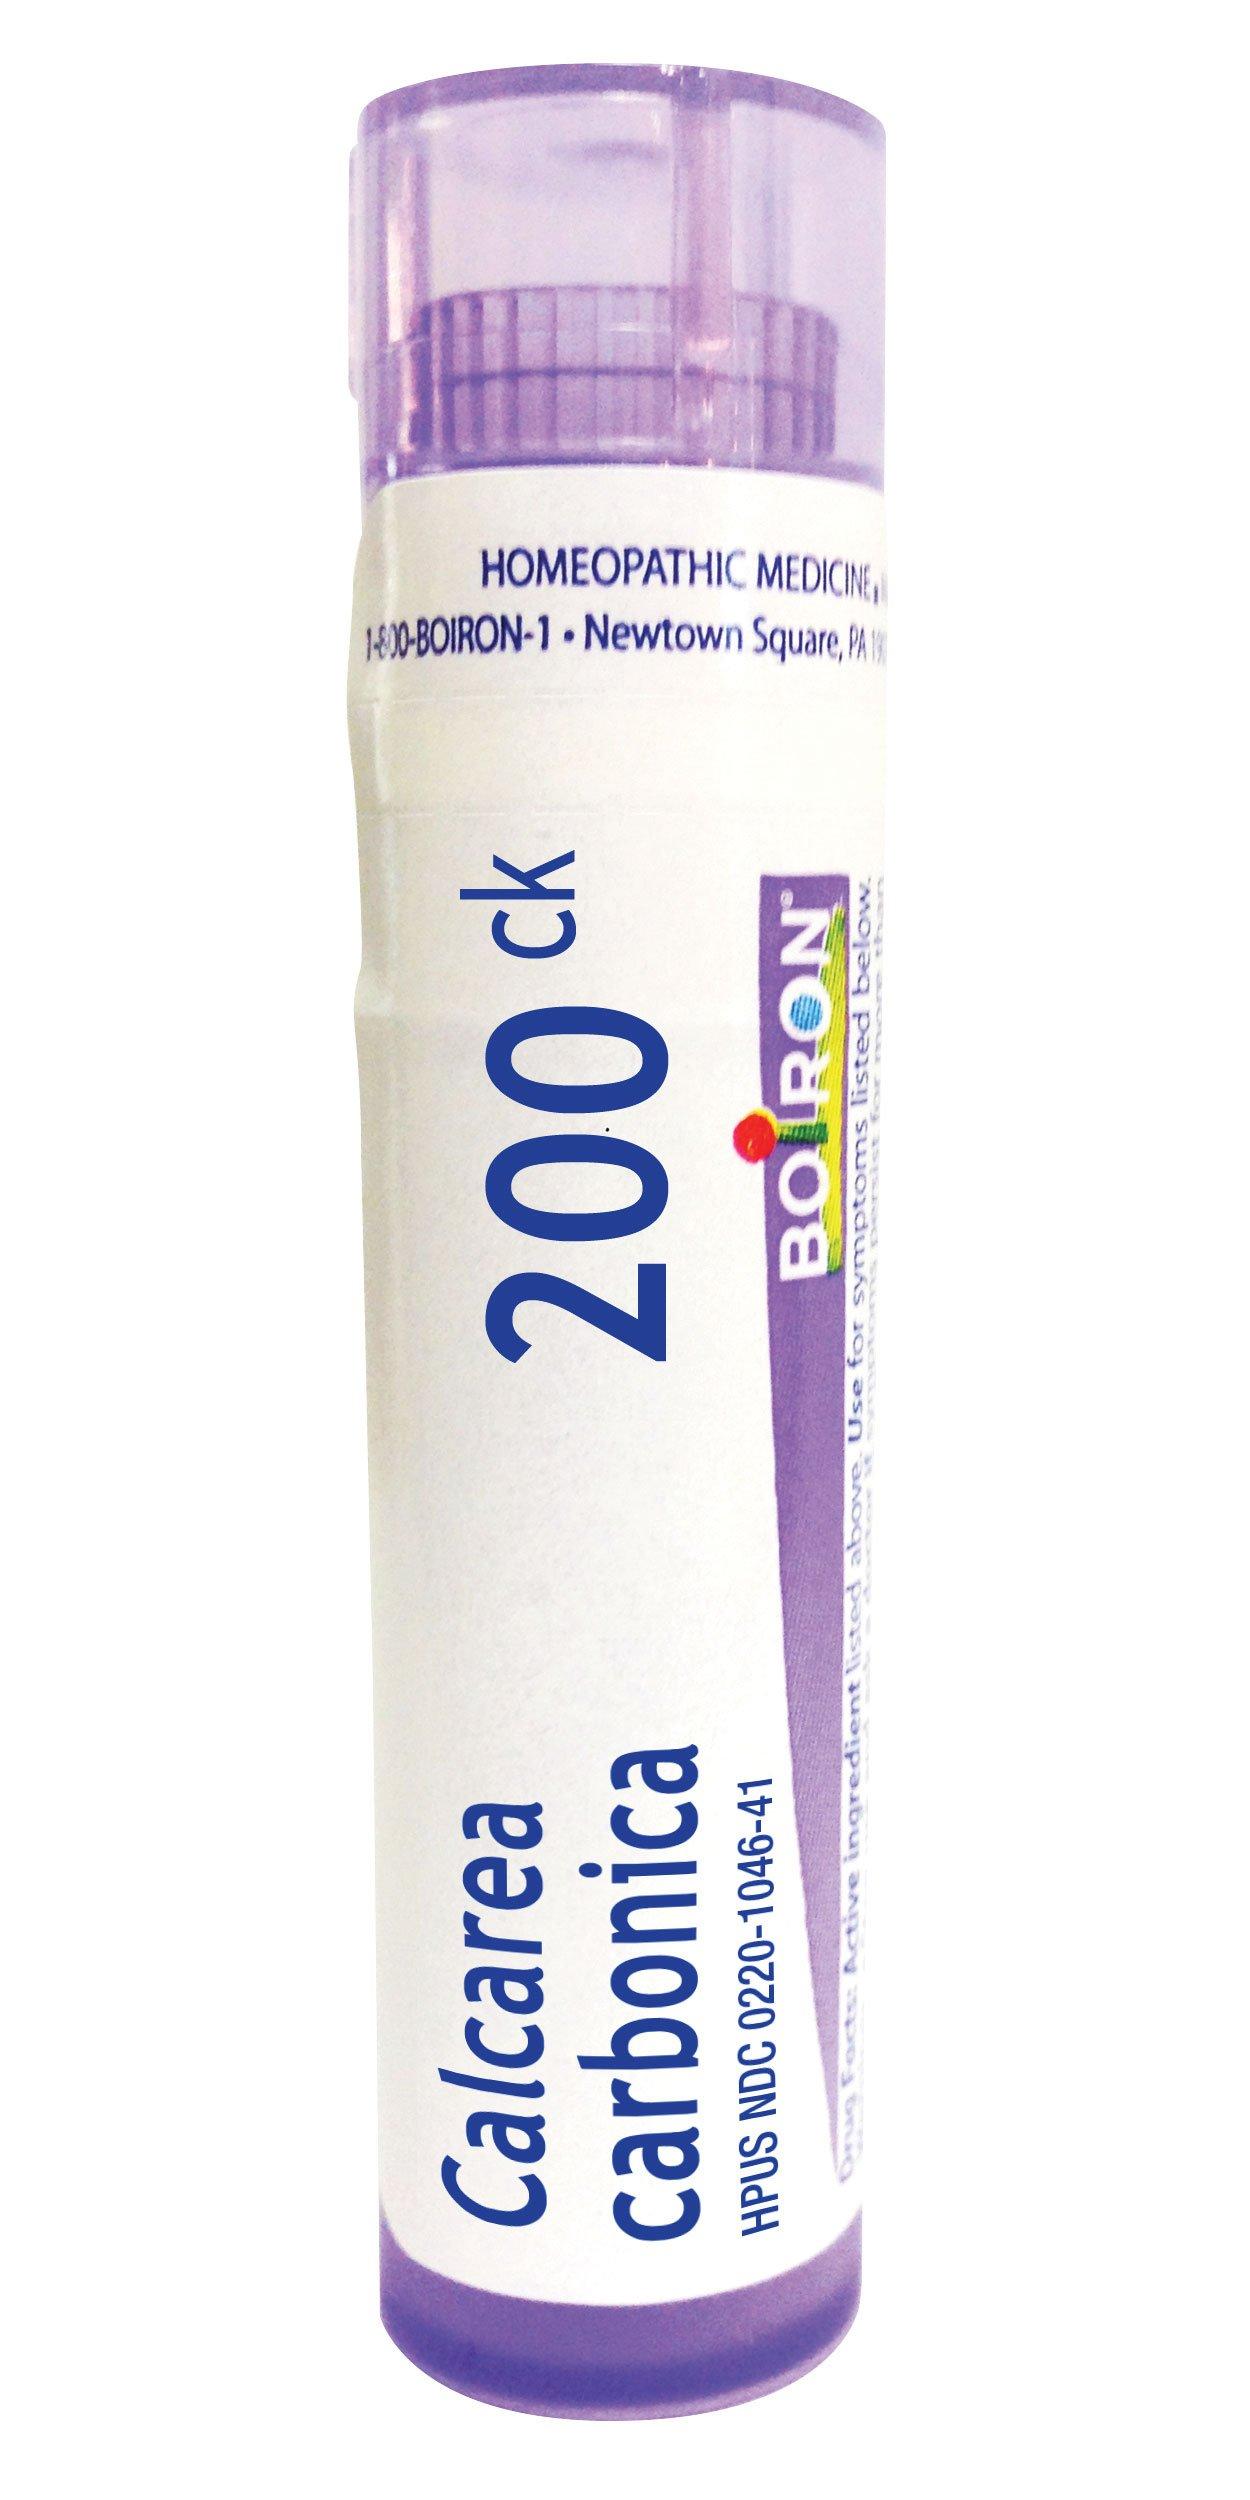 Boiron Calcarea Carbonica 200CK, Homeopathic Medicine for Cradle Cap, 80 Count